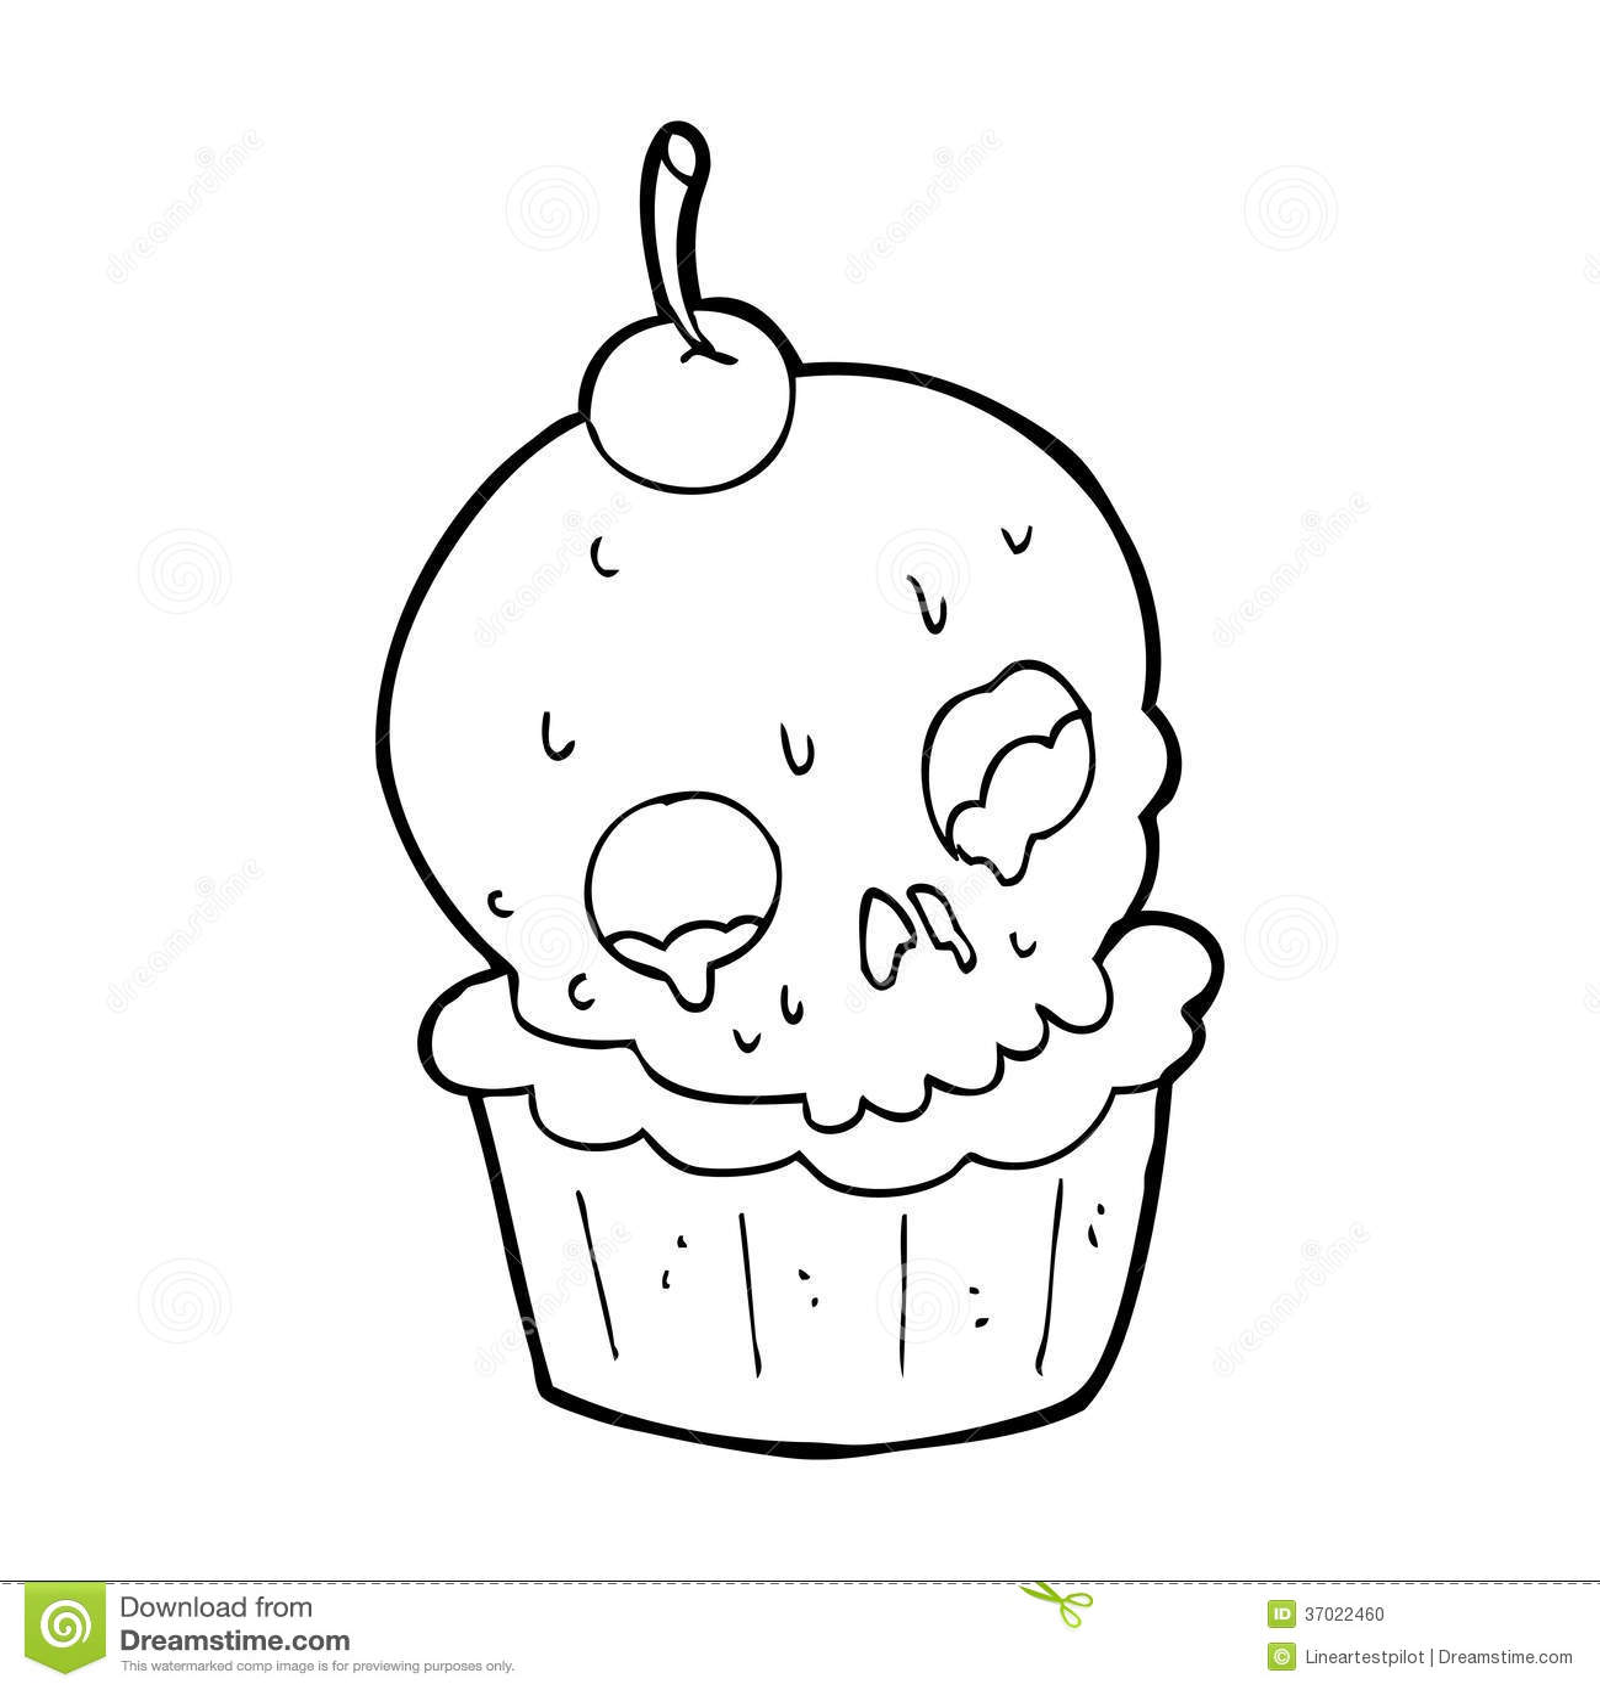 Cartoon halloween cup cake stock illustration. Image of ...